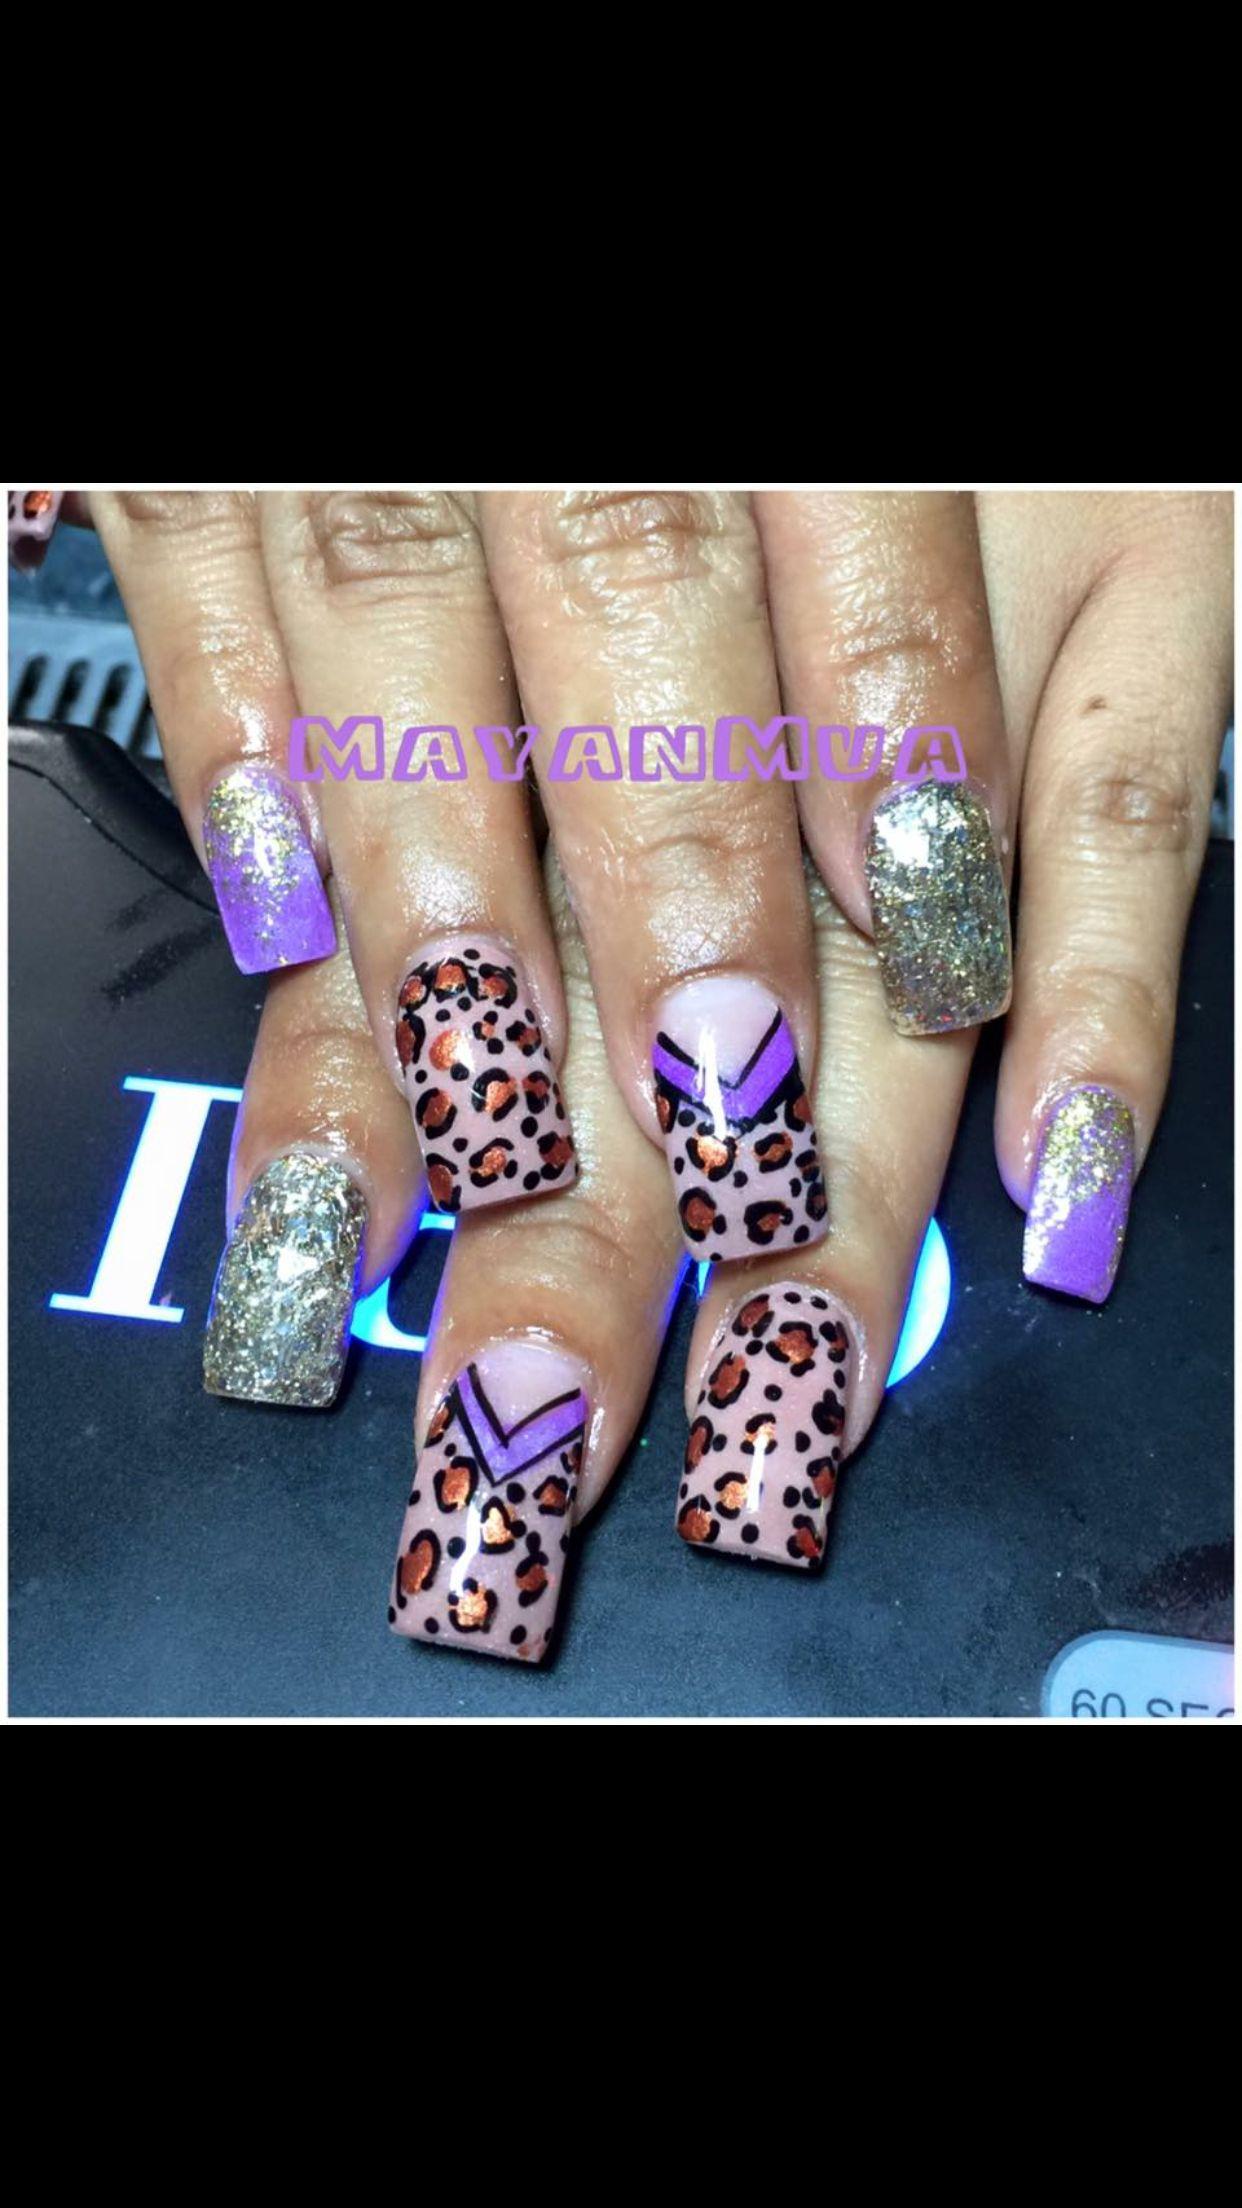 LG Salon, nail, acrylic, design, 3D, bling, coffin